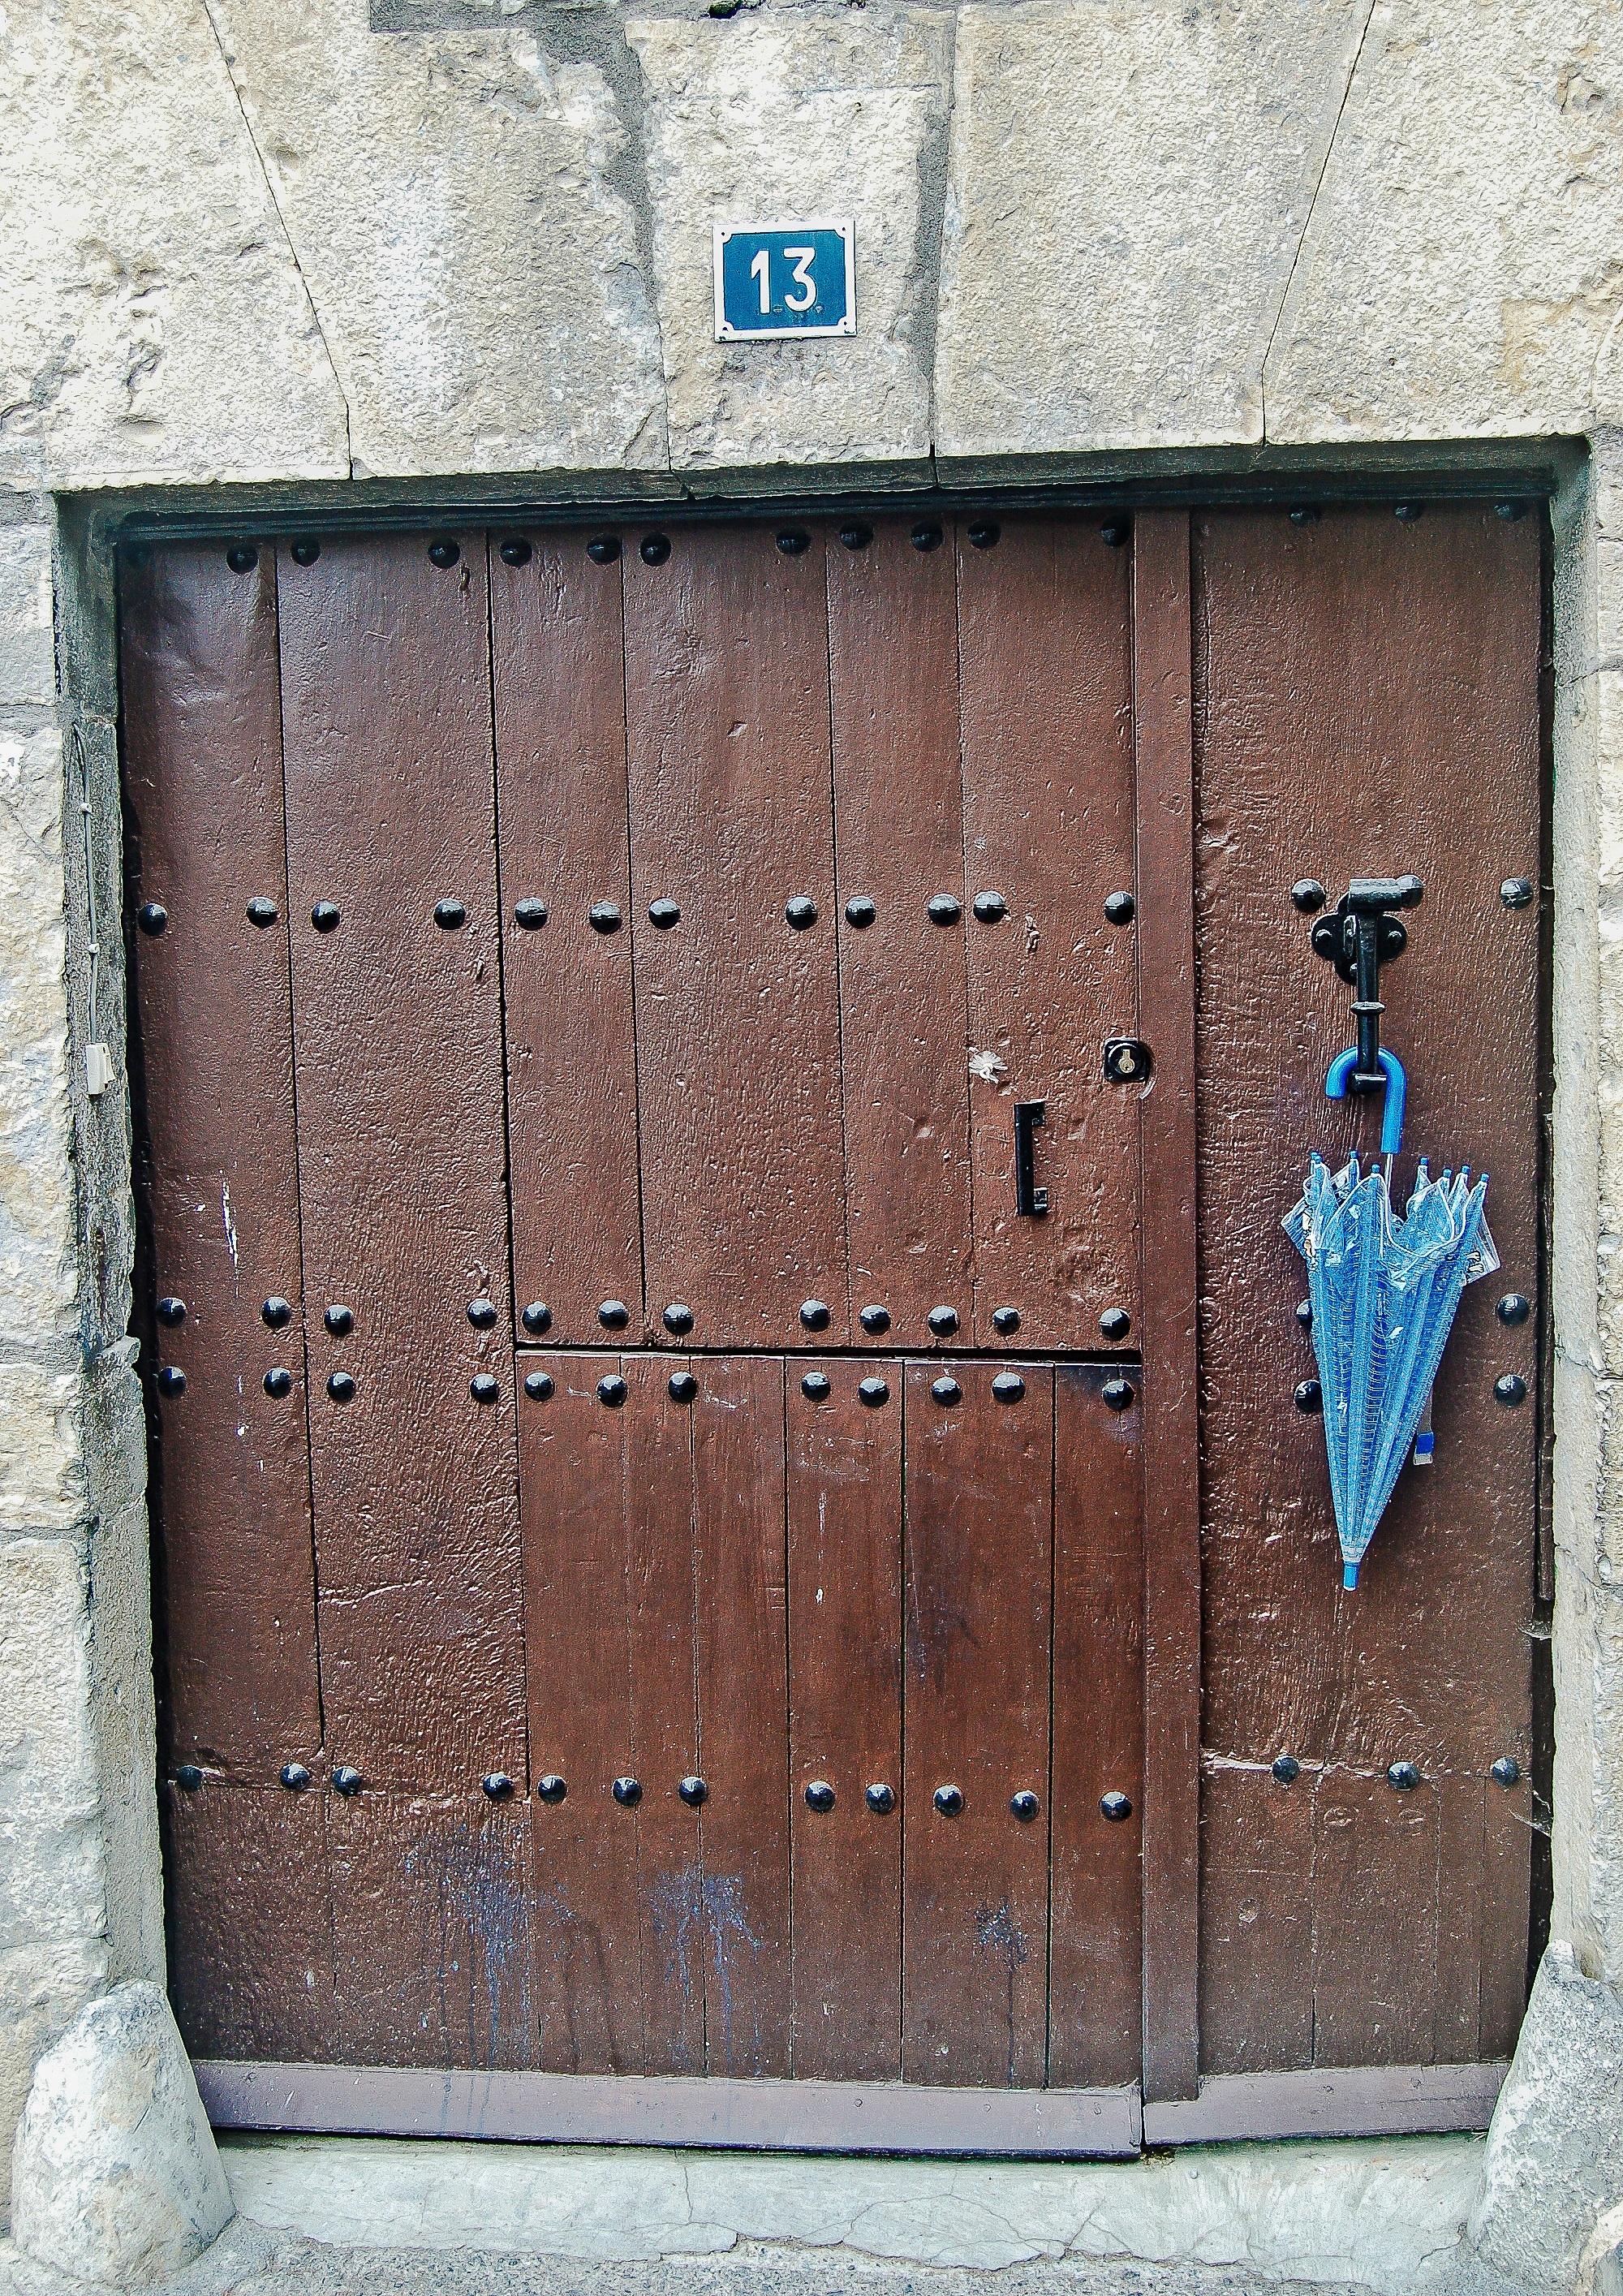 Architecture Wood House Window Wall Umbrella Metal Brown Facade Blue Gate  Door Design Input Portal Man